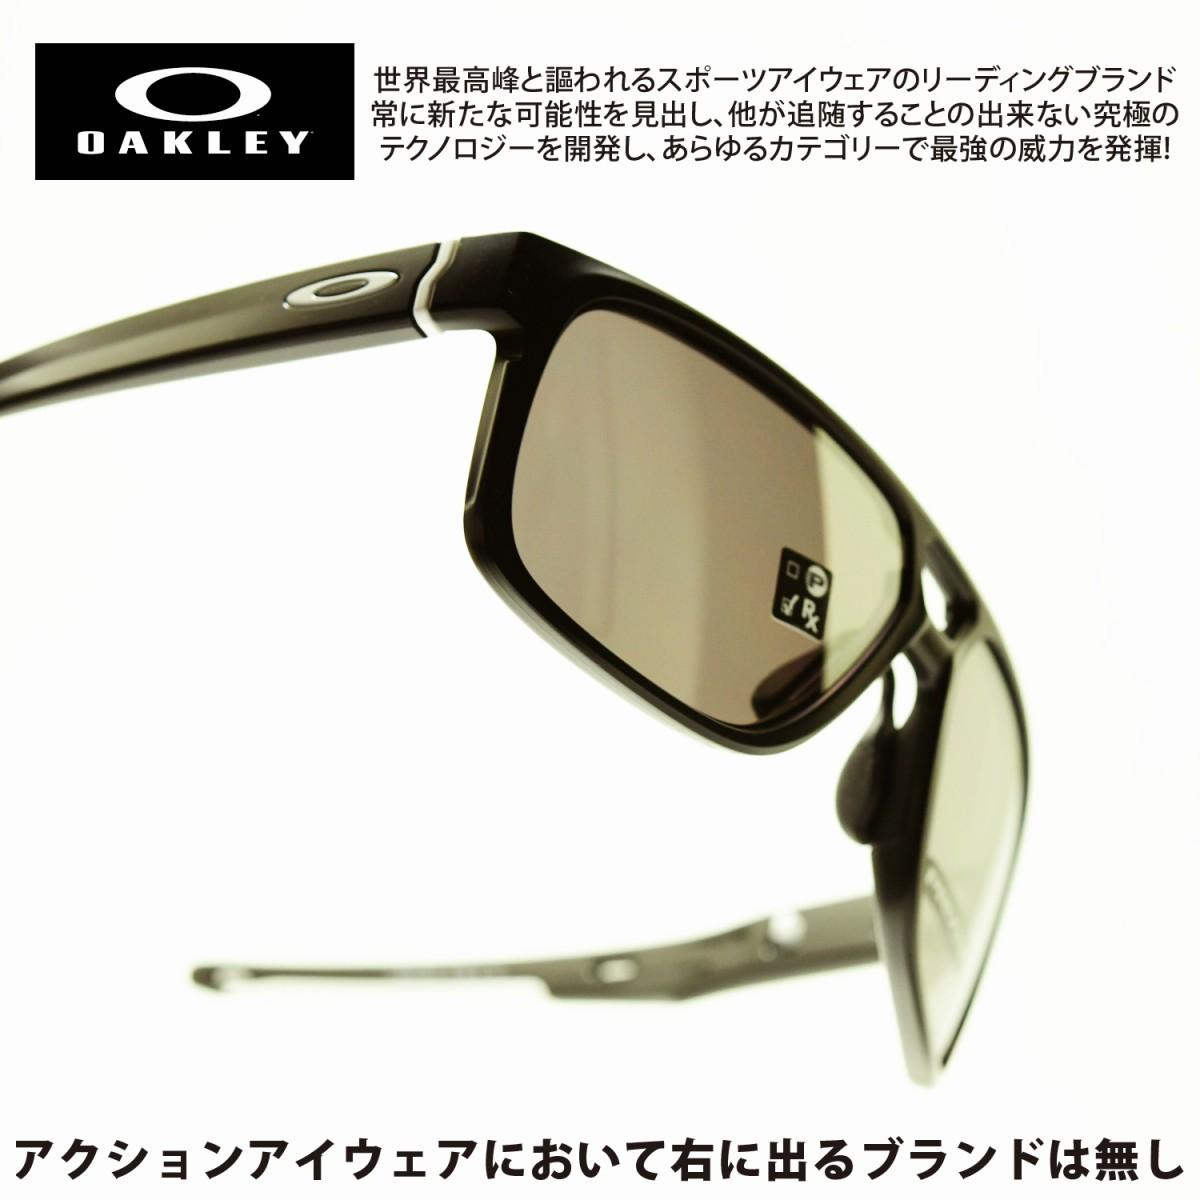 OAKLEY オークリーCROSSRANGE PATCH クロスレンジ パッチ ASIAN FIT アジアンフィットMATTE BLACK/PRIZM BLACK IRIDIUM OO9391-02